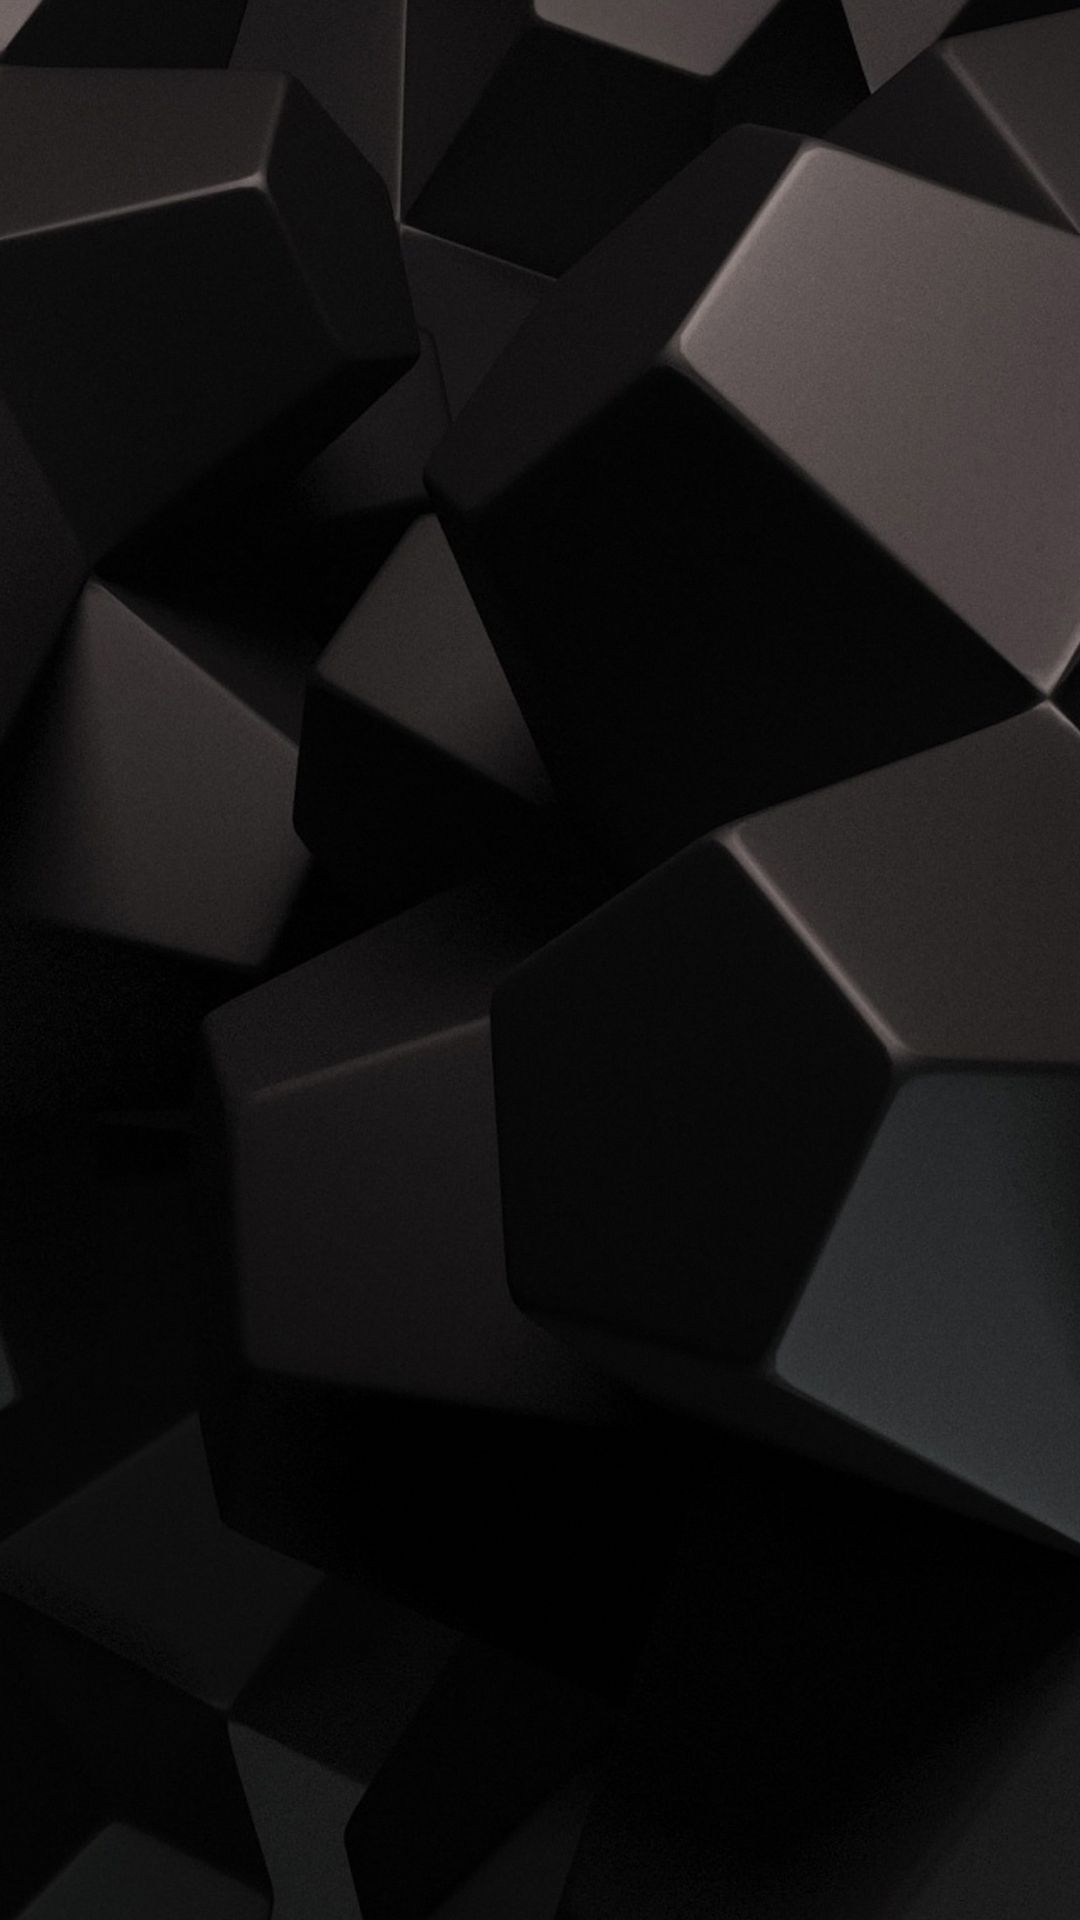 Mobile Wallpaper 3d Black Grey Wallpaper Android Black And Grey Wallpaper Black Wallpaper For Mobile